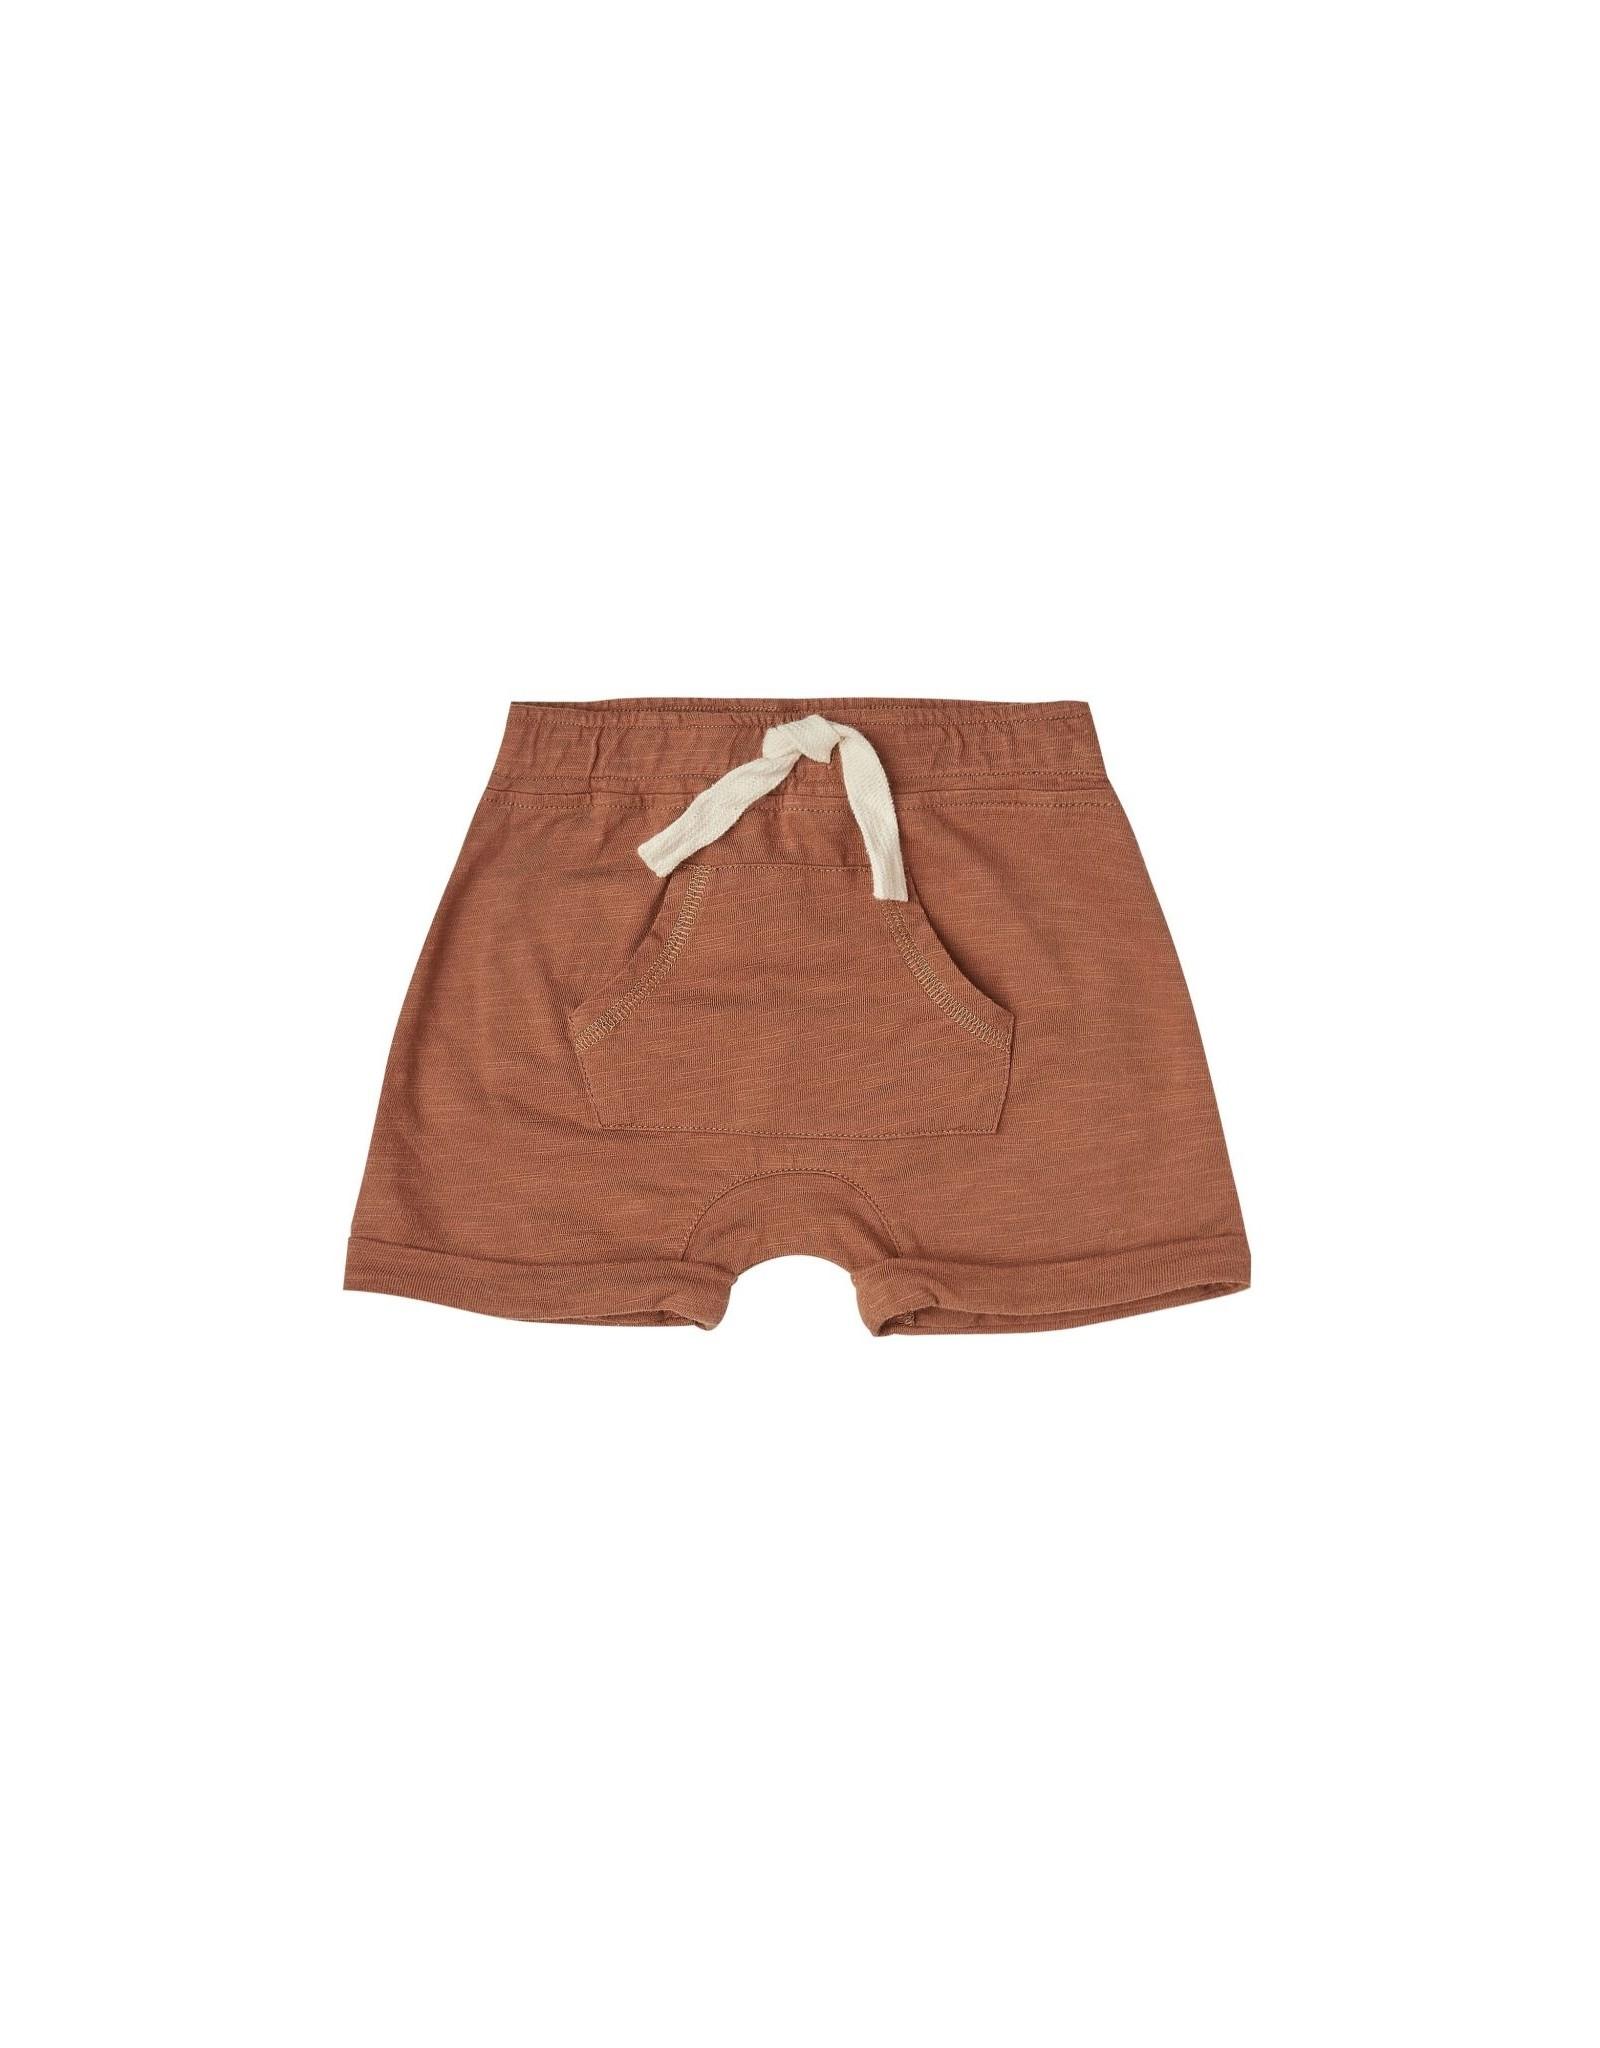 Rylee & Cru Rylee & Cru Front Pouch Shorts